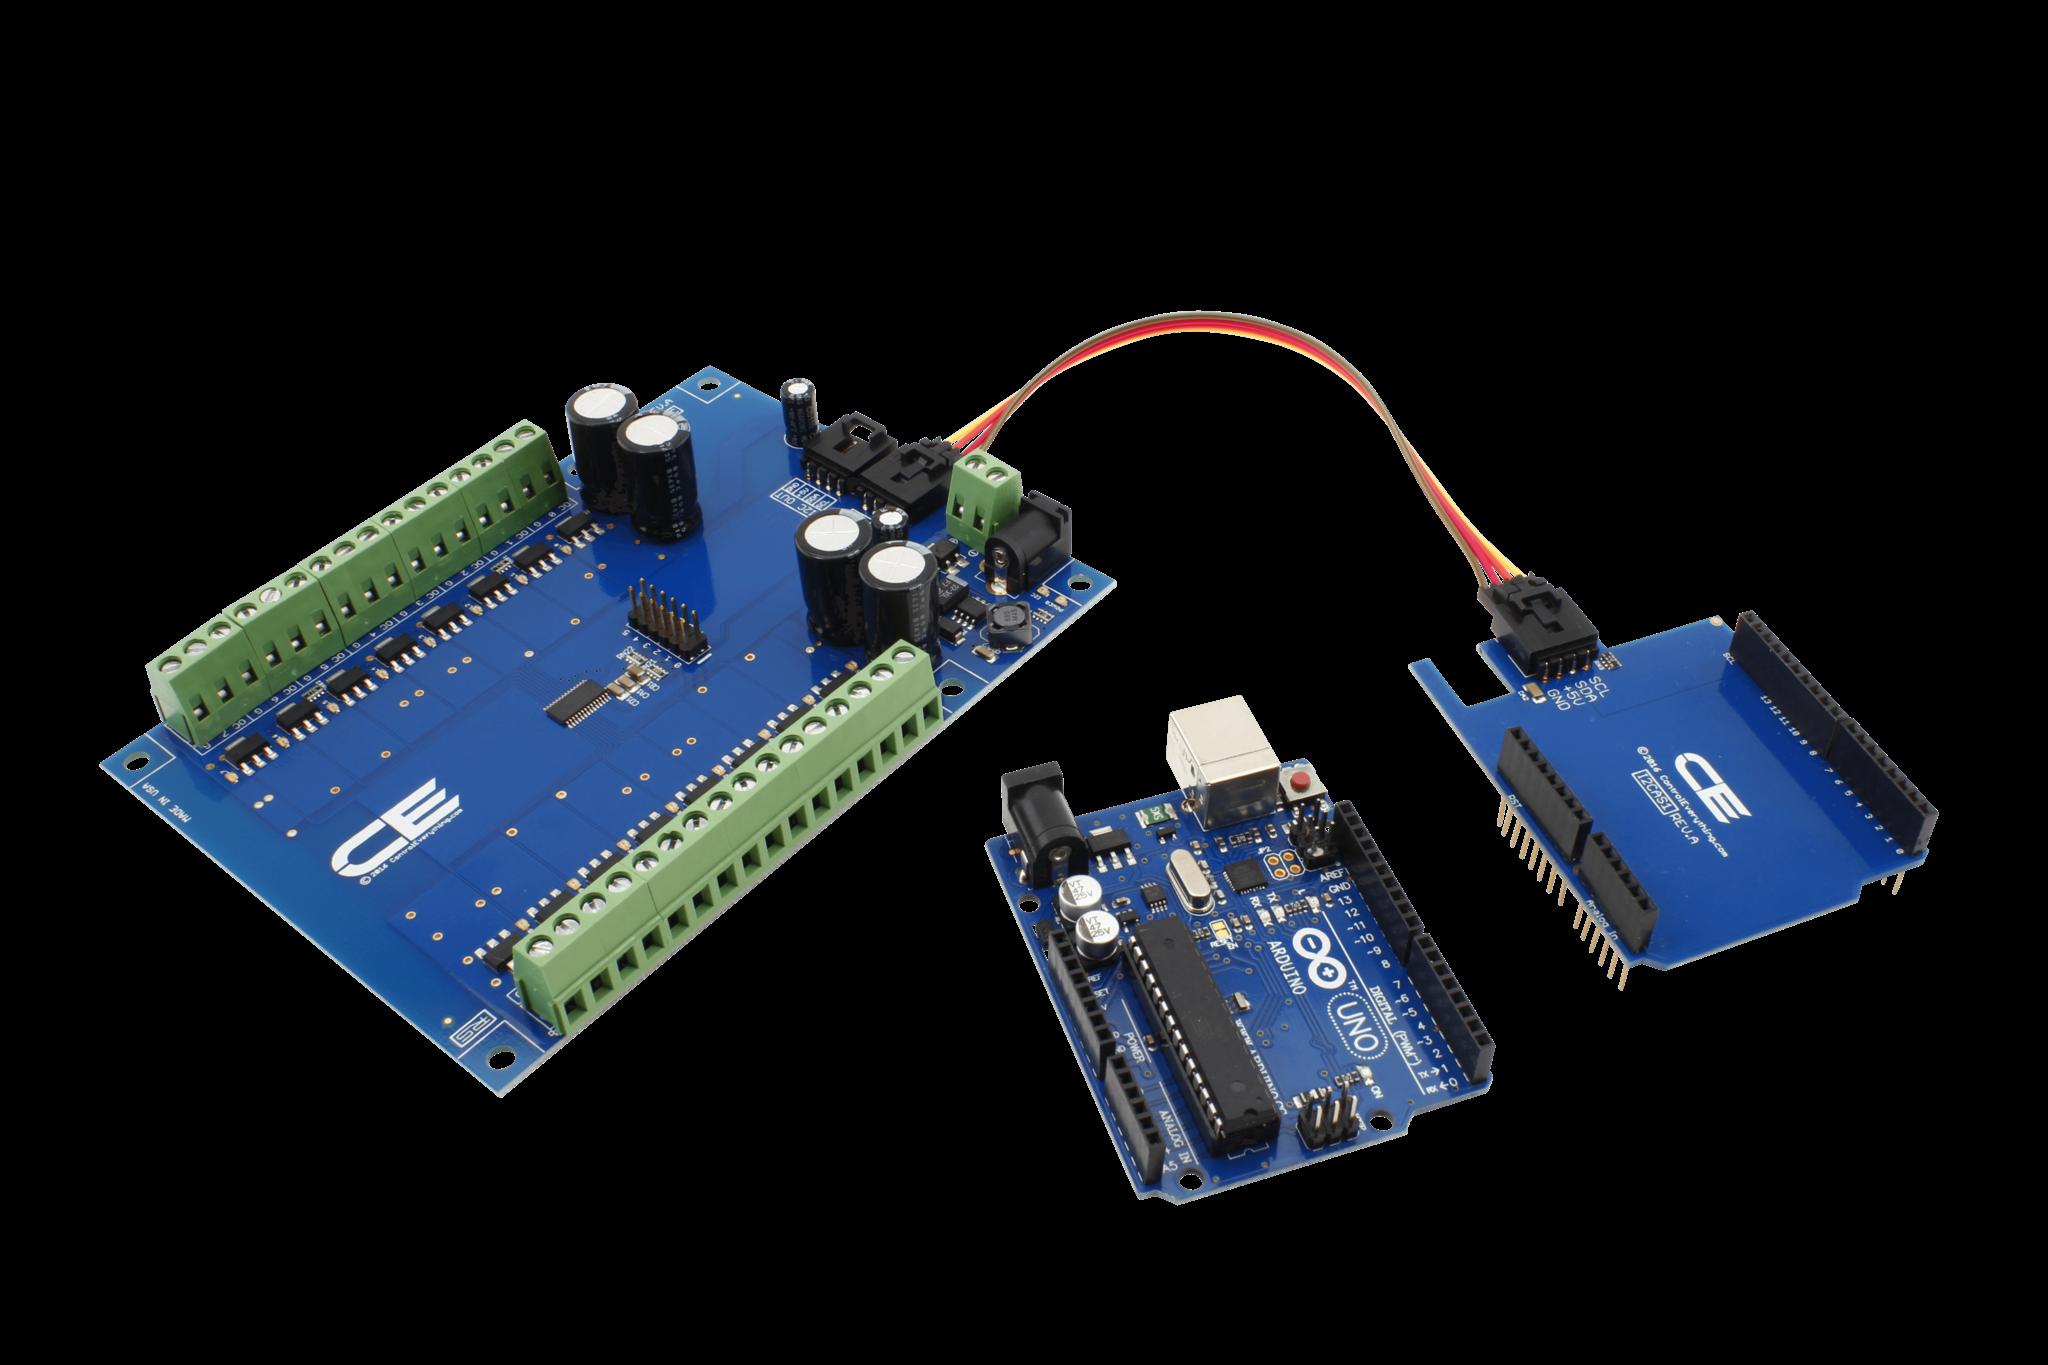 SOIC24 interrompere NXP-pca9555d,112-I2C GPIO 9555